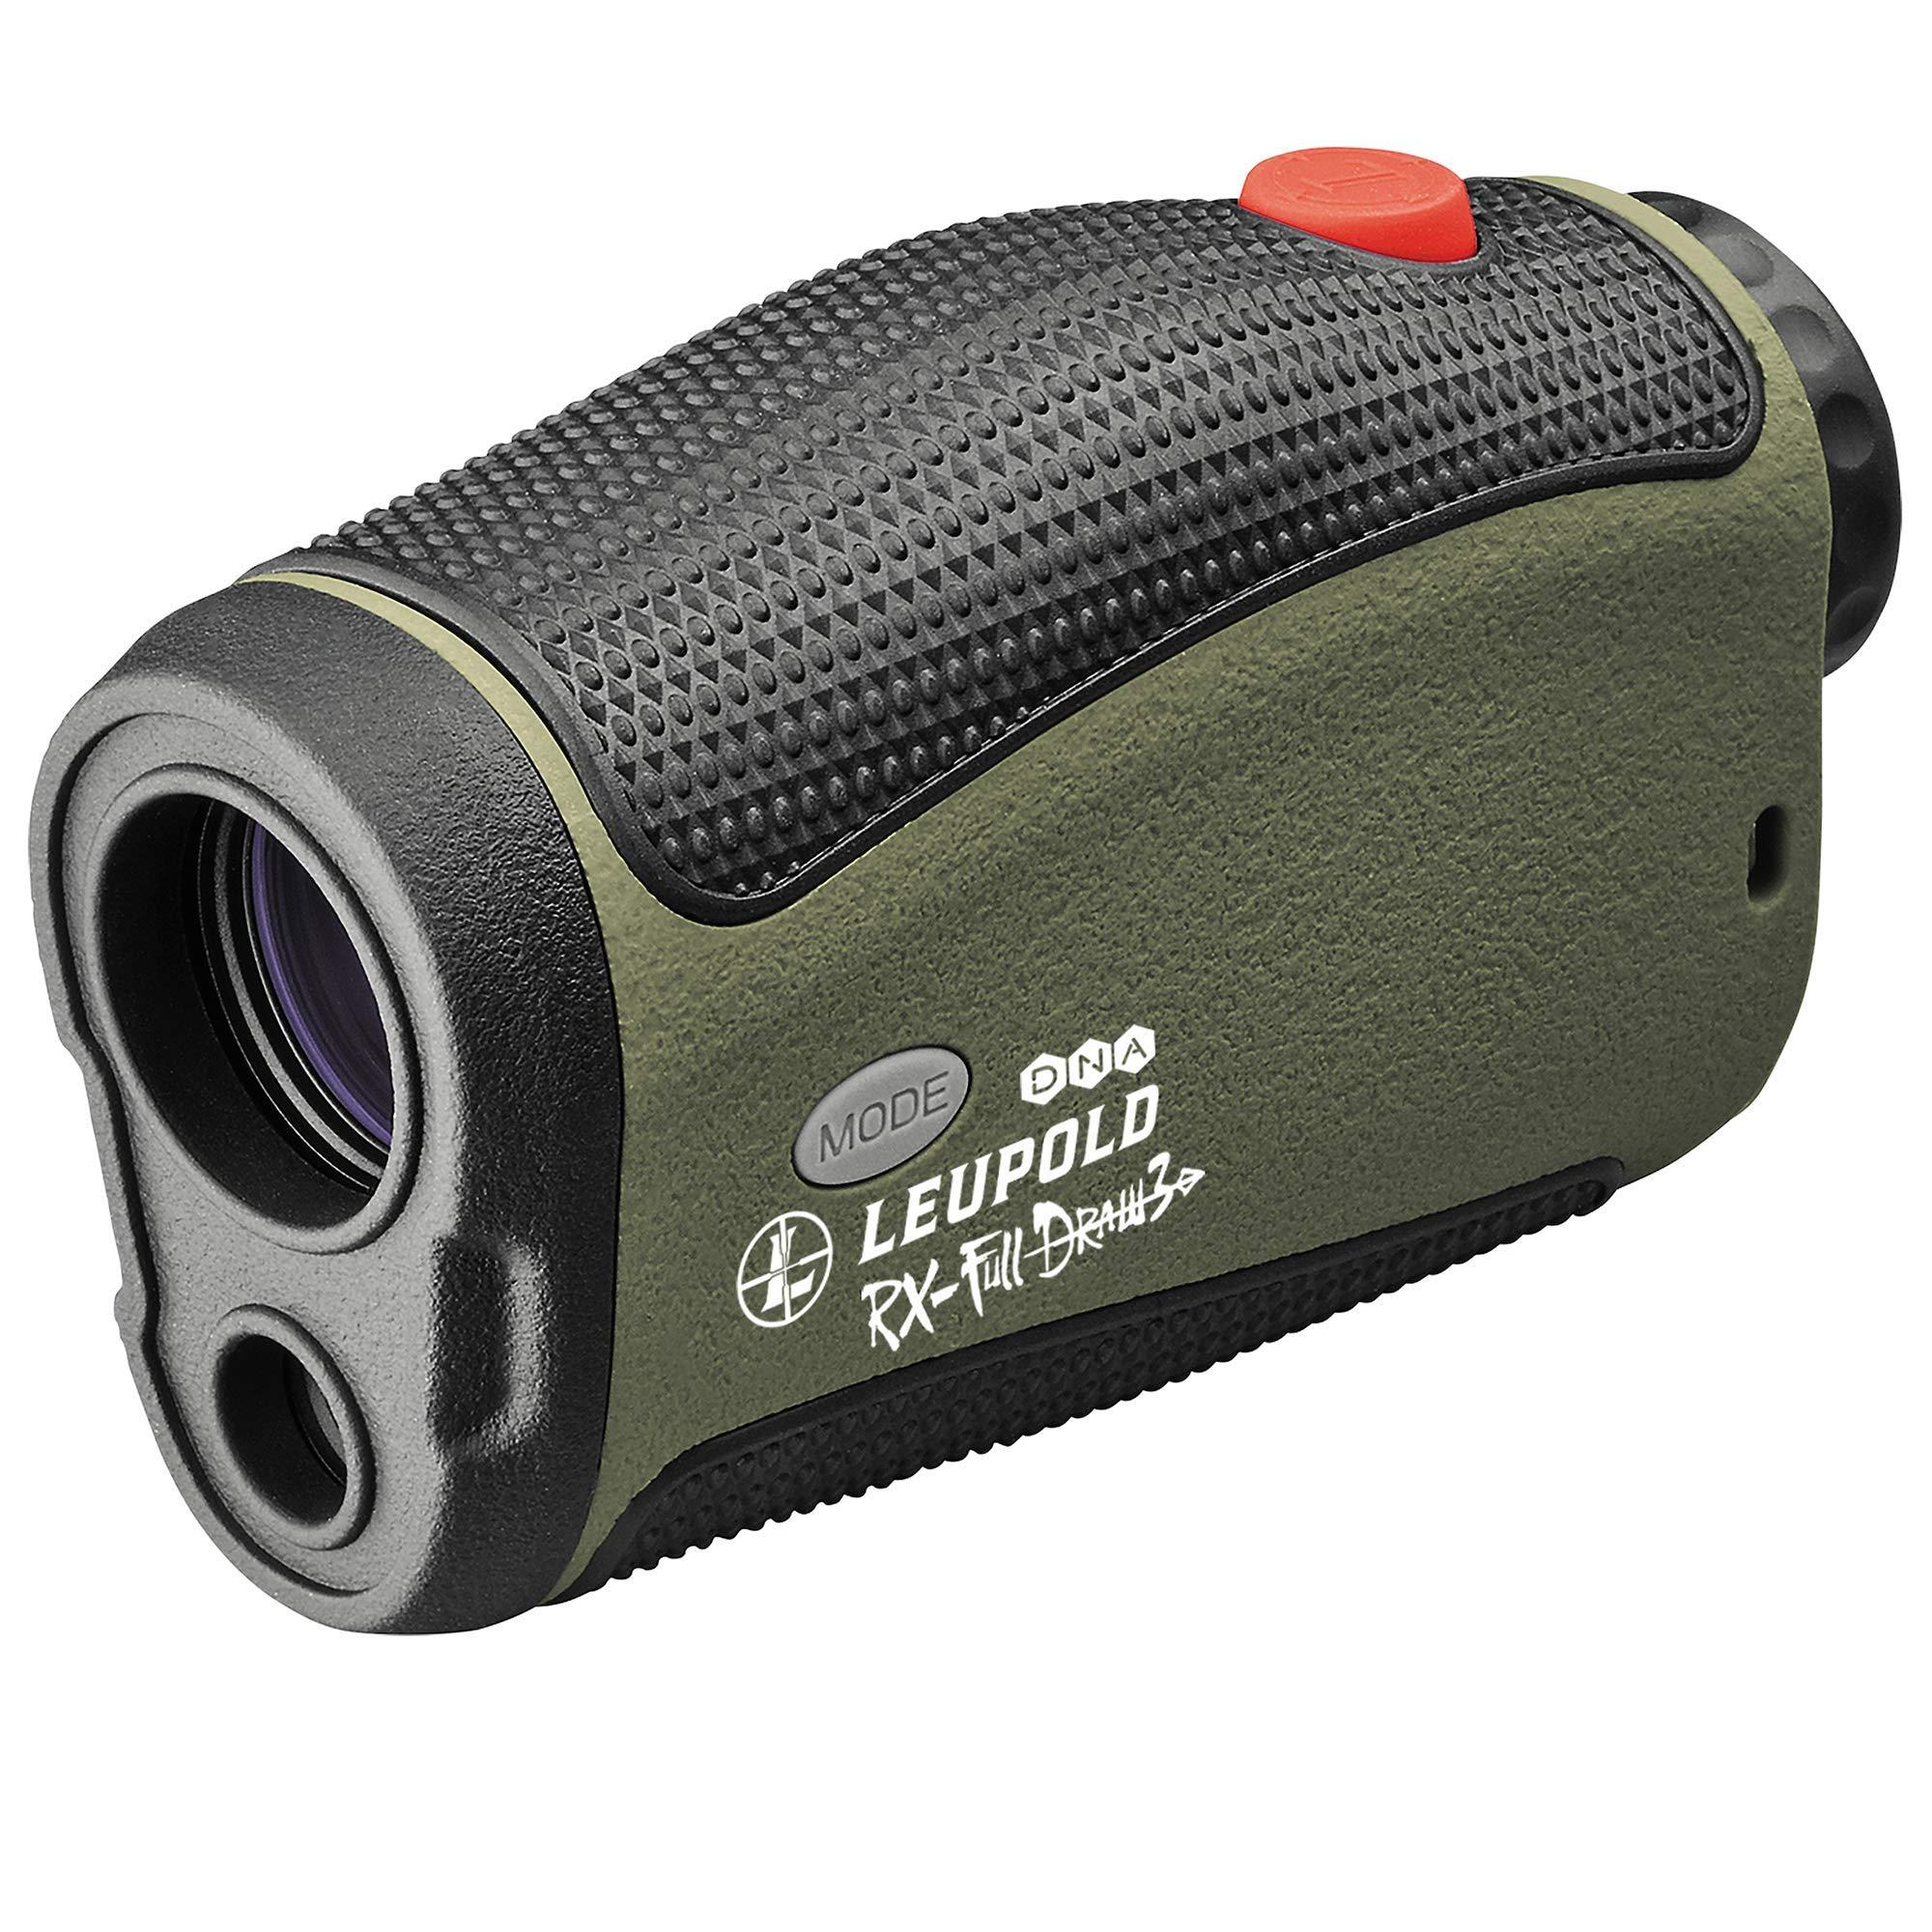 Leupold RX-FullDraw 3 Laser Rangefinder by Leupold